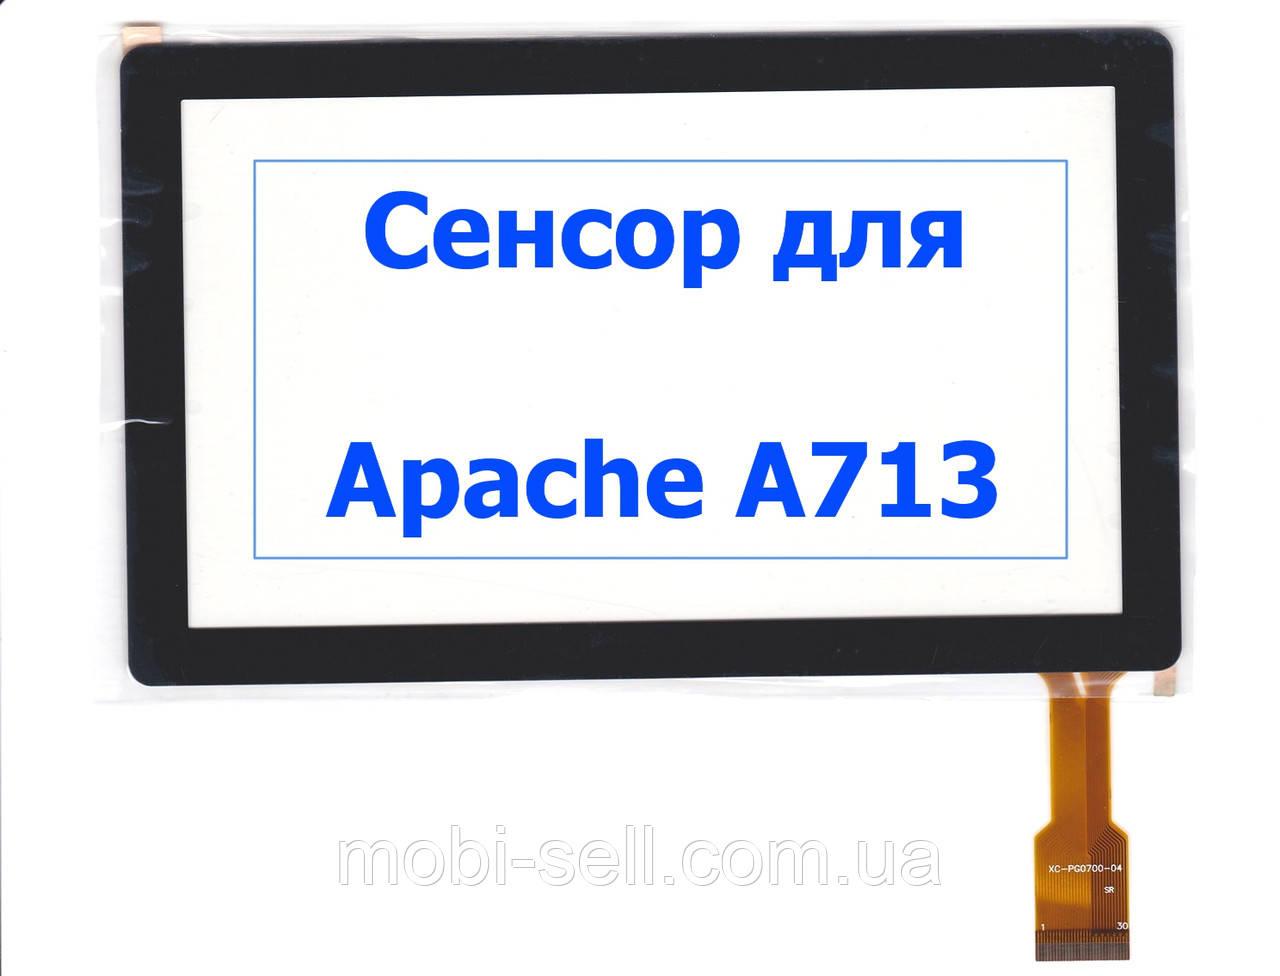 Сенсорный экран (тачскрин) для Apache A713